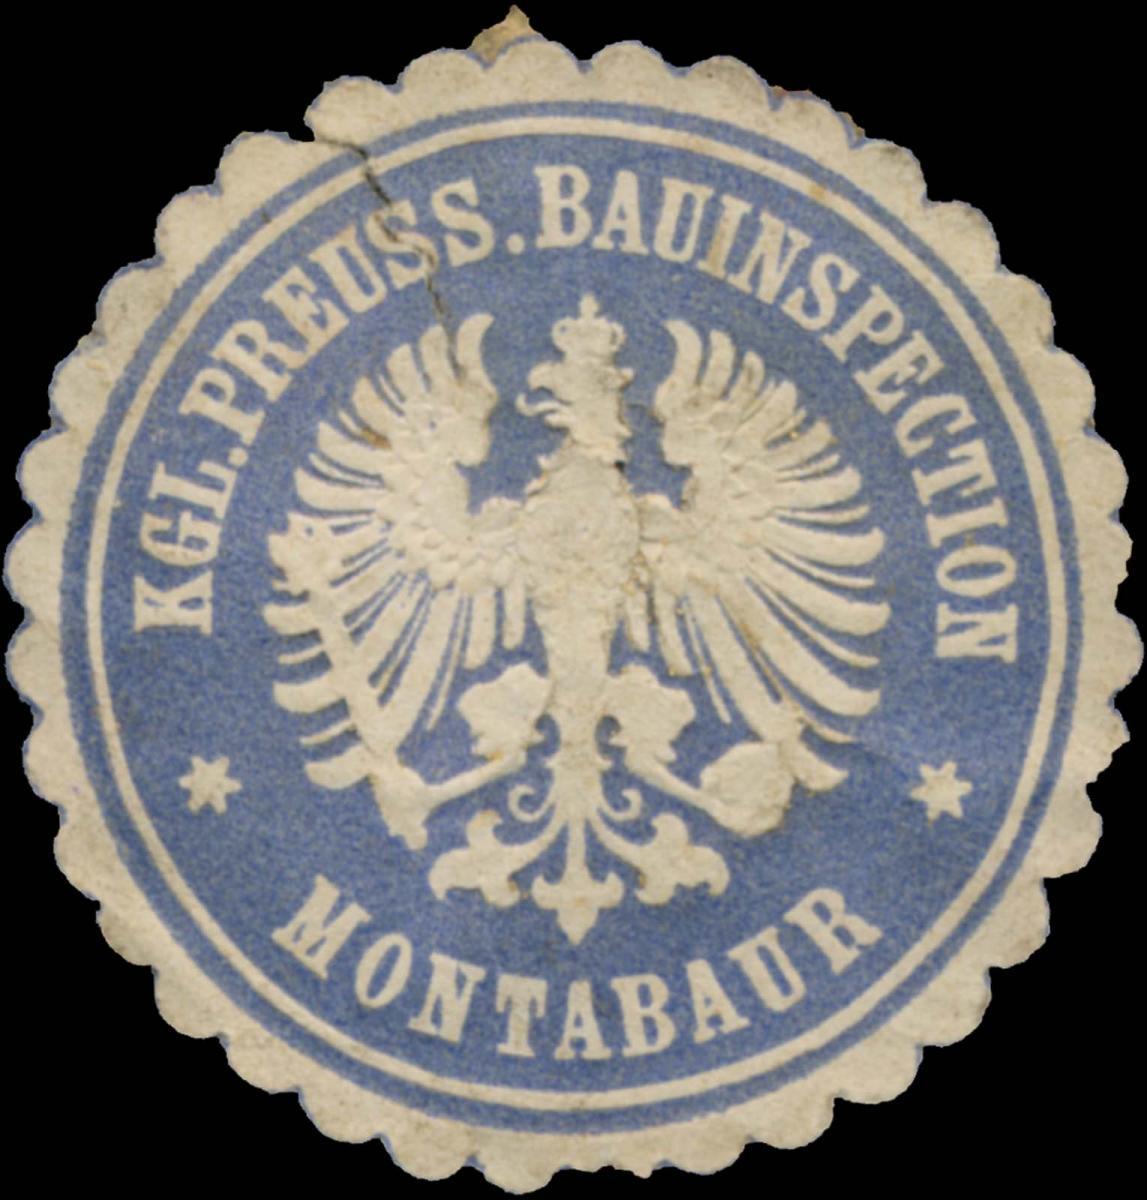 K.Pr. Bauinspection Montabaur